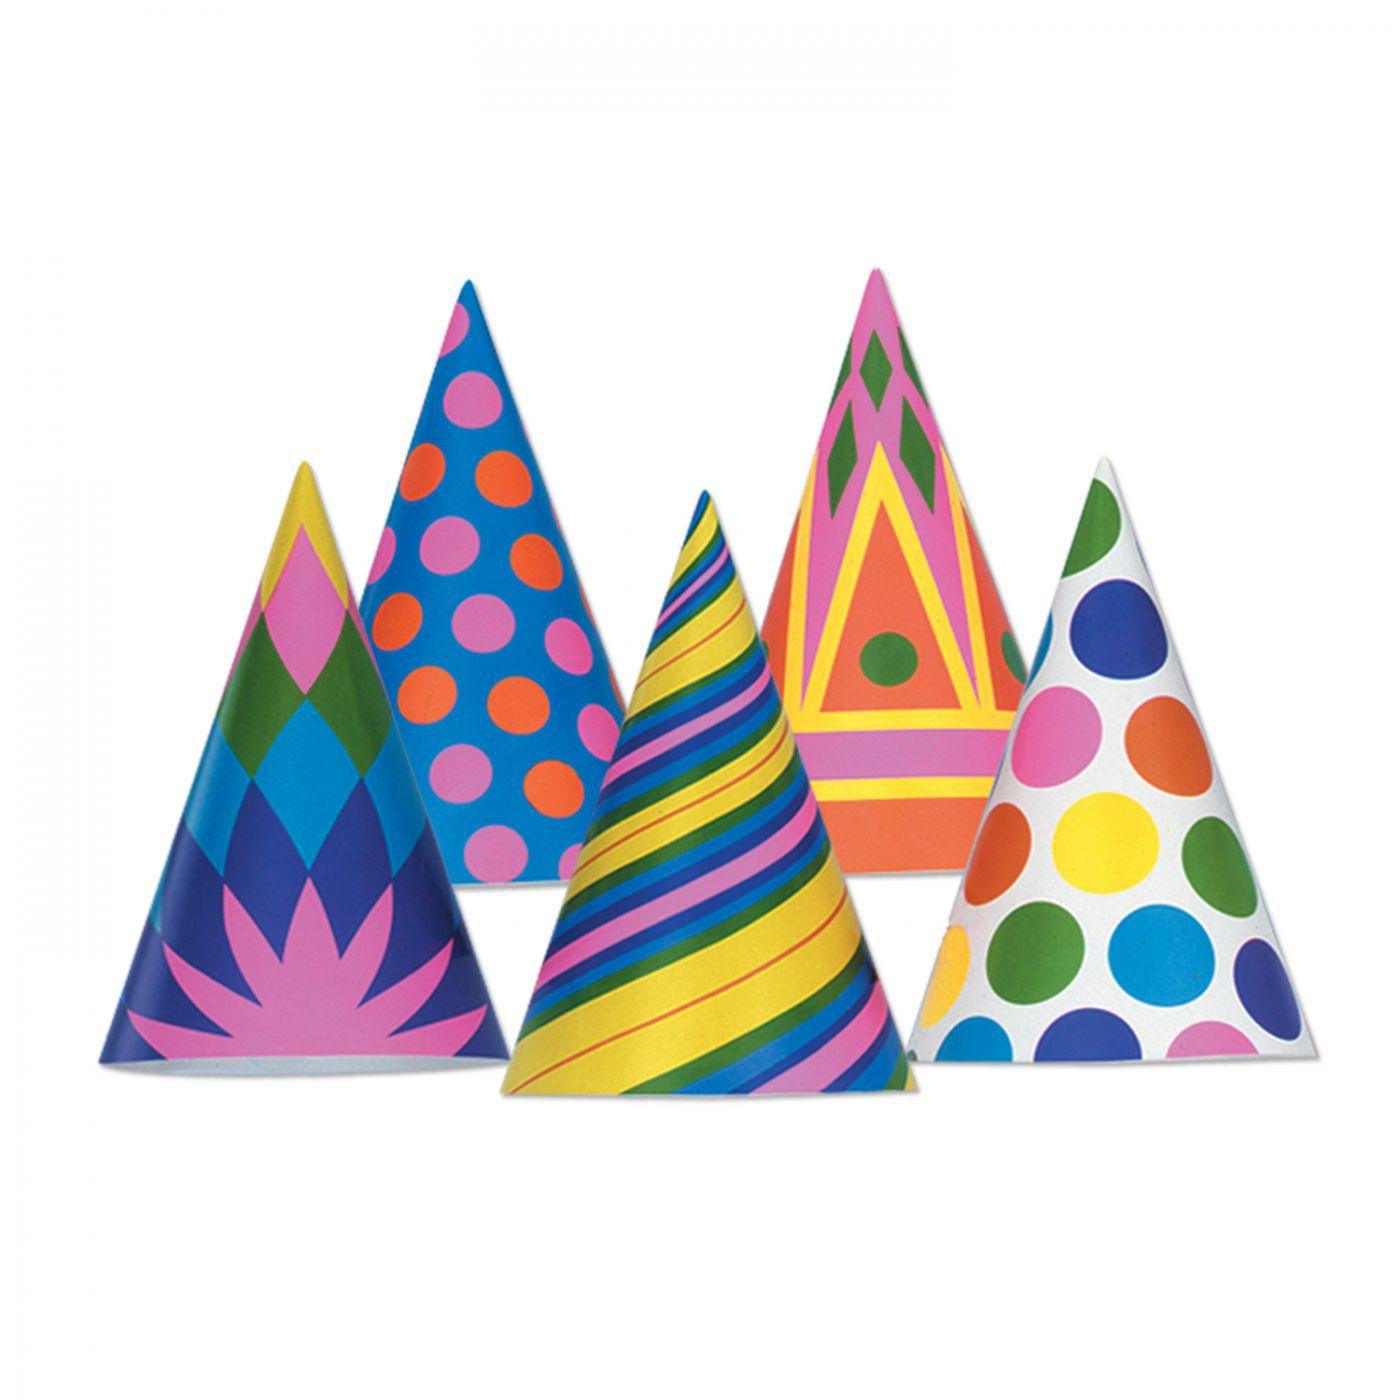 Cone Hats (144) image